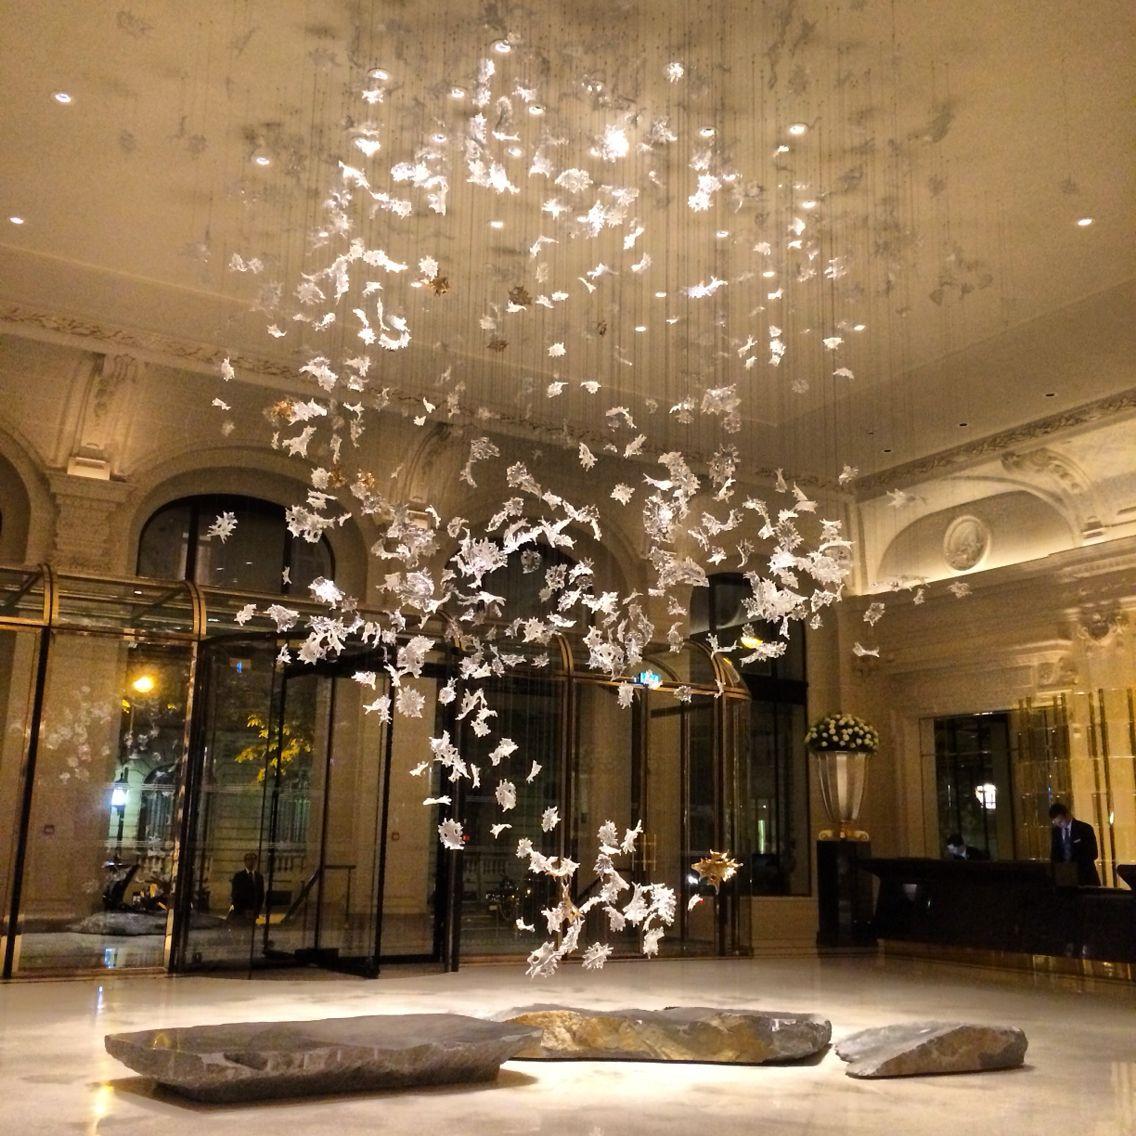 Hotel peninsula paris dise o pinterest interior de for Hoteles diseno paris